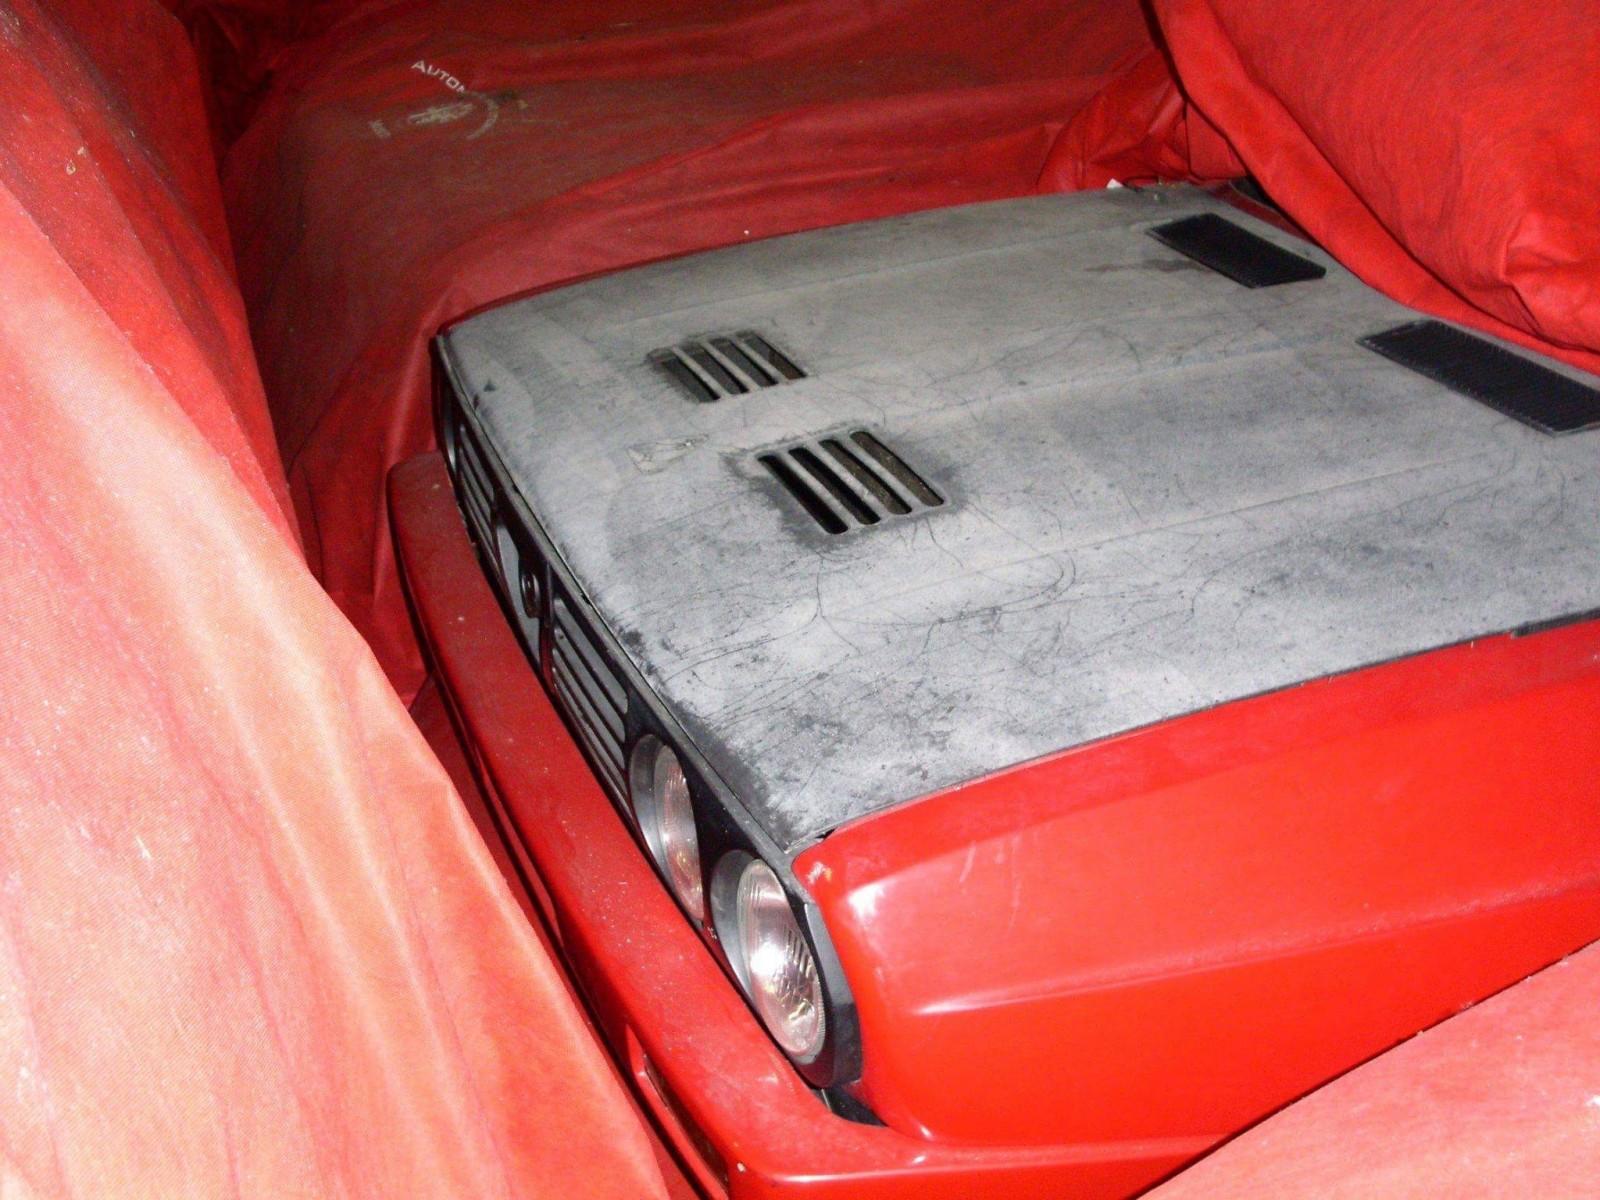 Alfas bortglömda Grupp B-prototyp